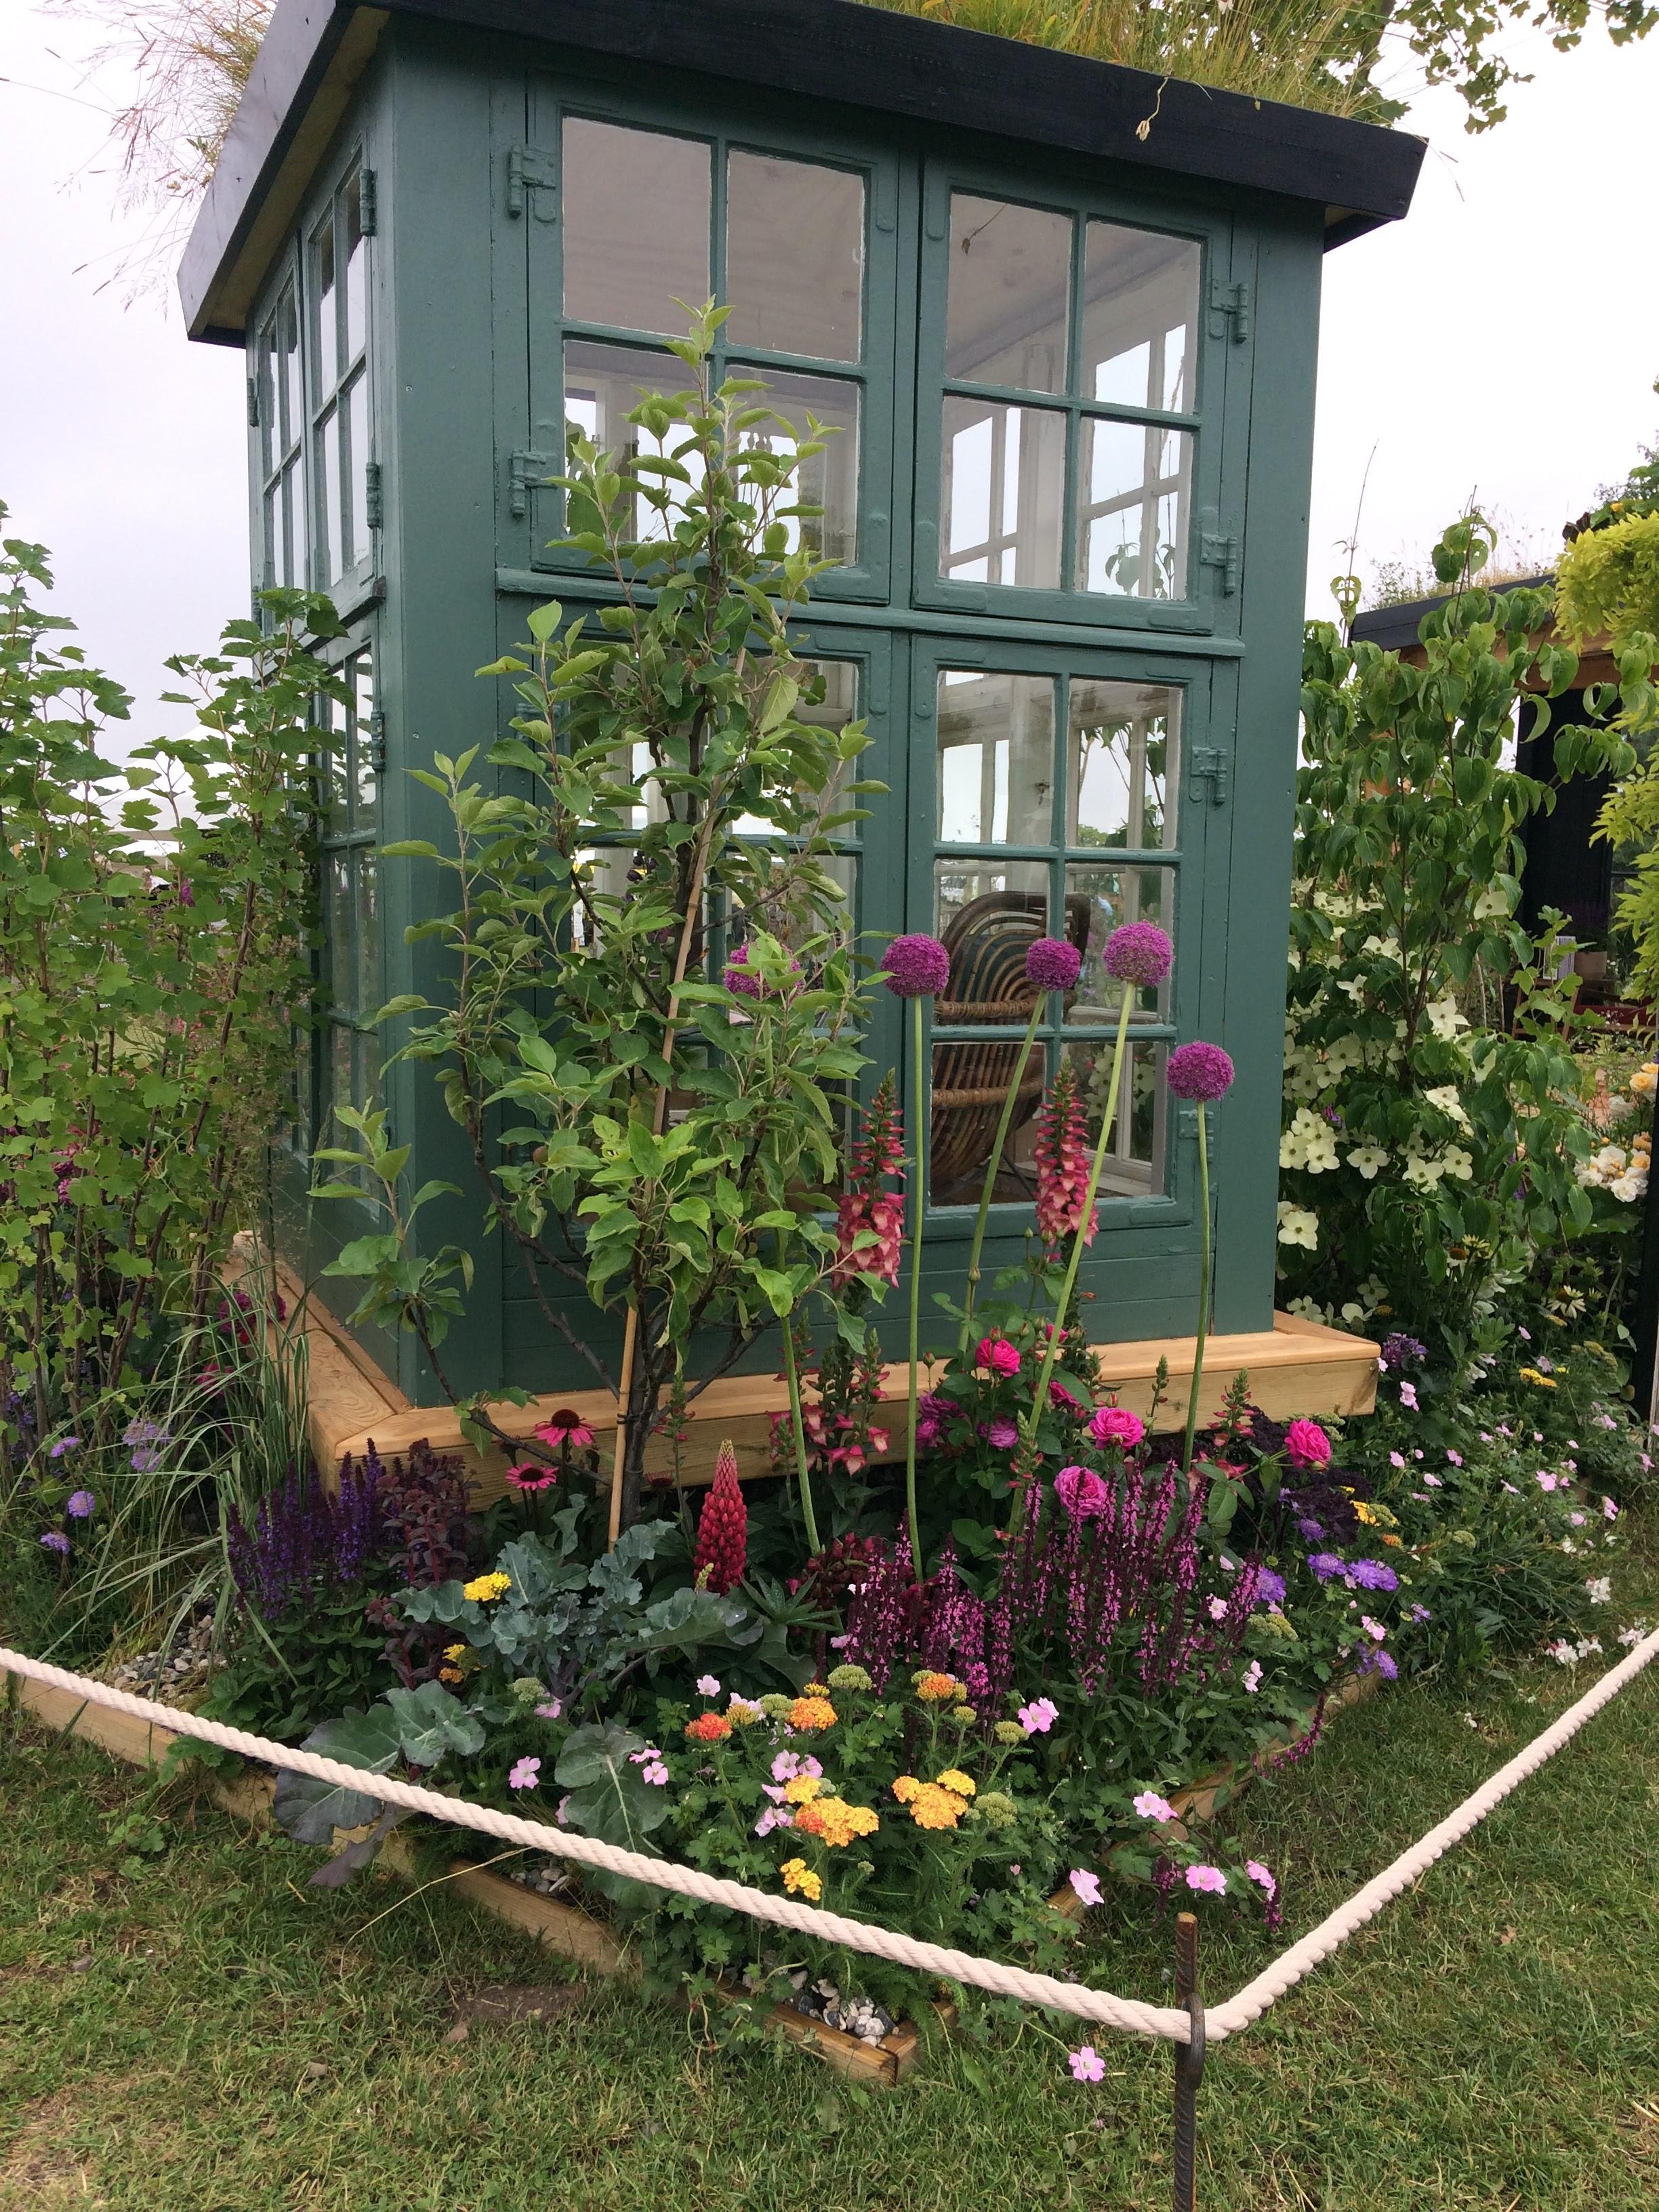 dorthe kvist lille havehus En vild og vidunderlig urban oase